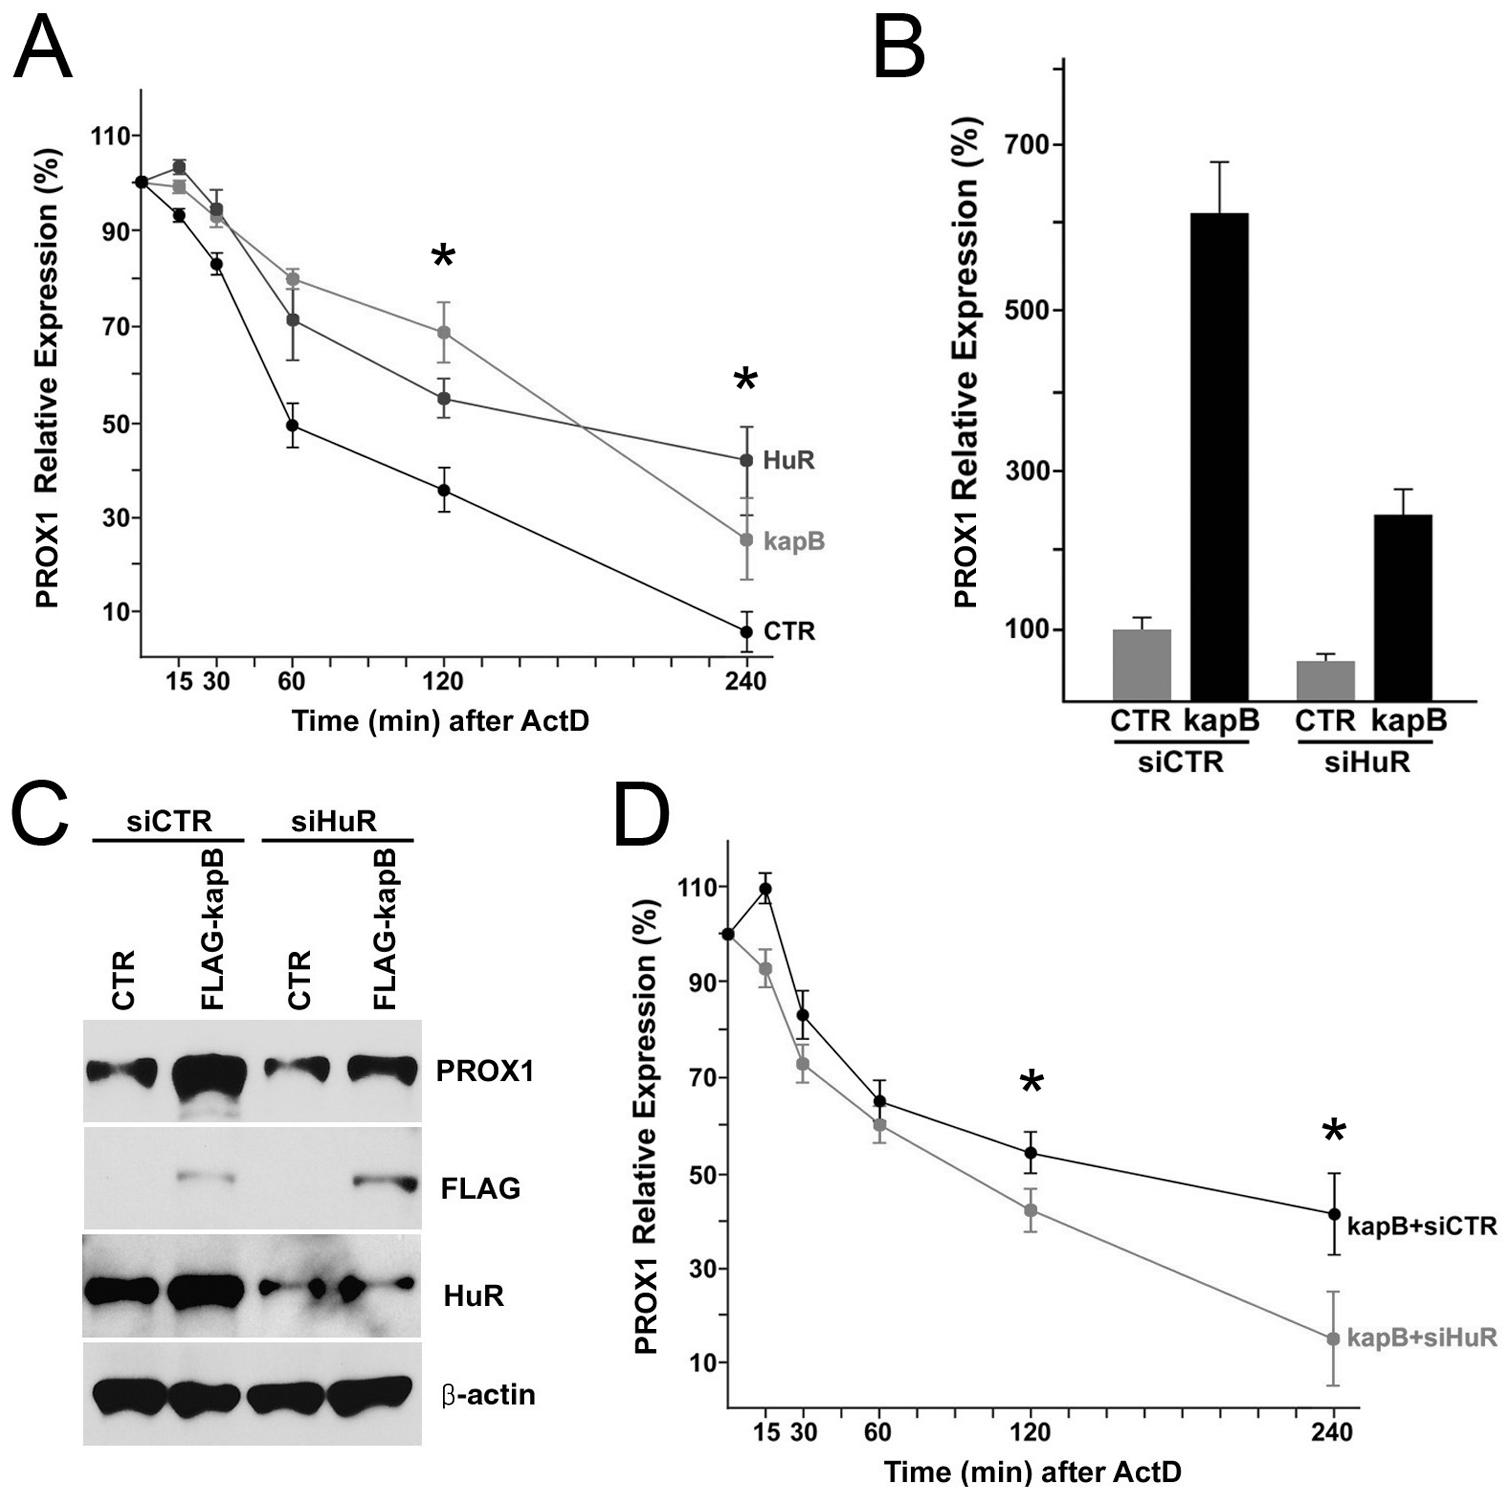 Kaposin-B upregulates PROX1 by promoting its mRNA stability through HuR.